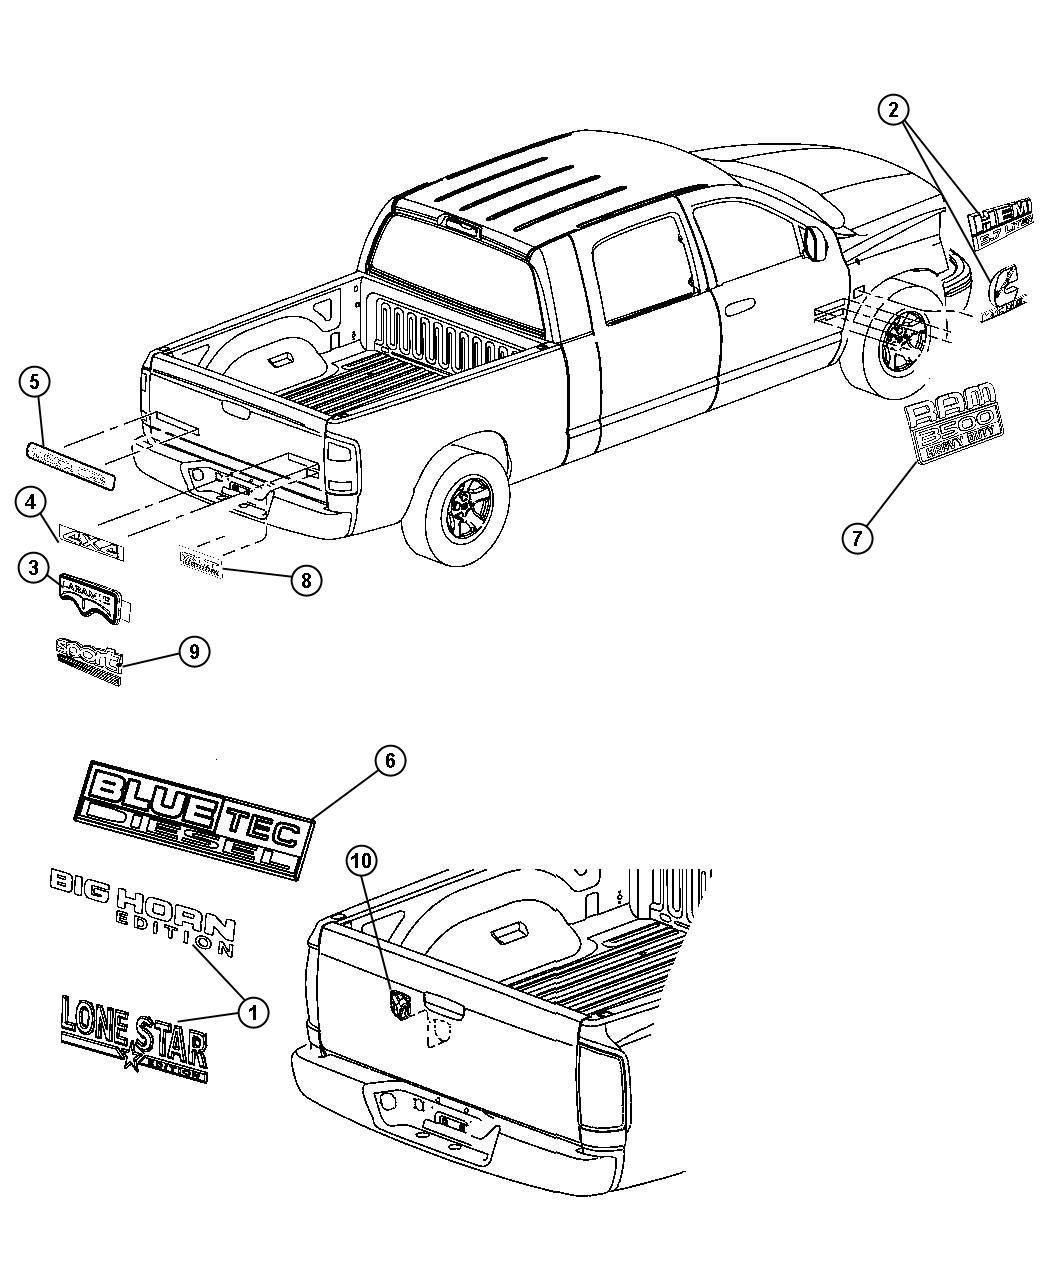 Dodge Ram 3500 Nameplate. [bluetec diesel], [bluetec